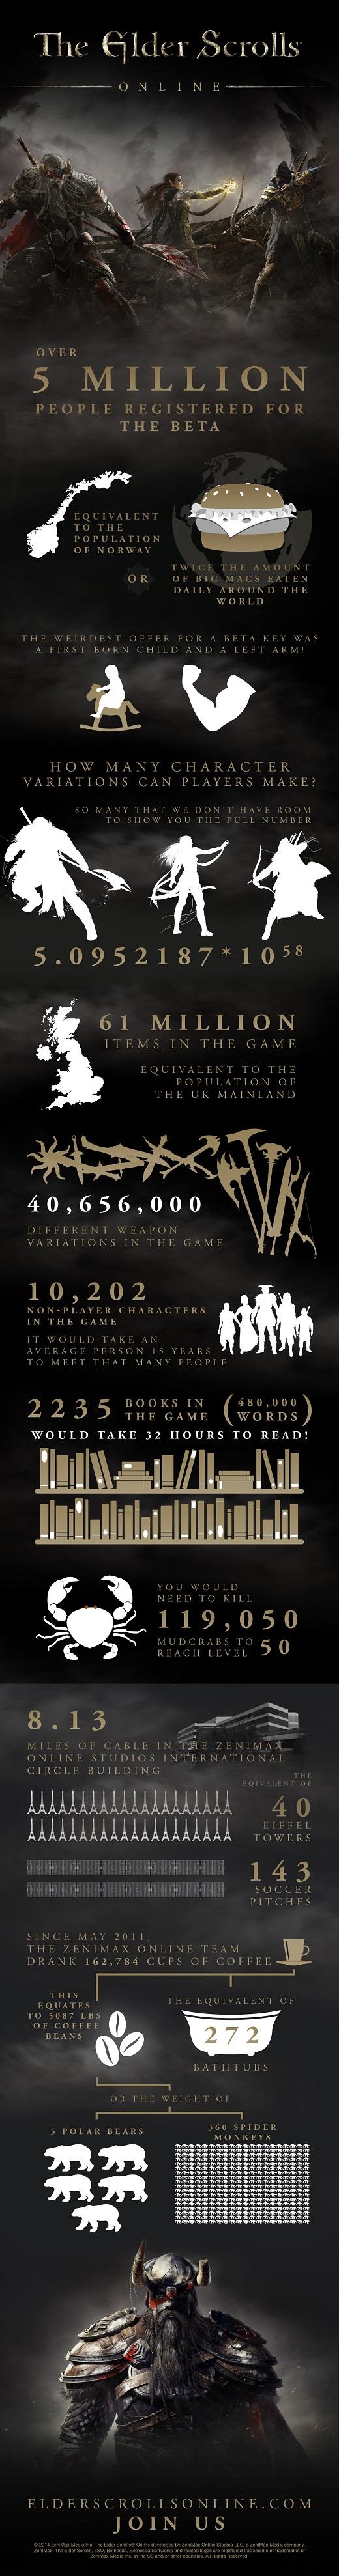 The Elder Scrolls Online infographic 520